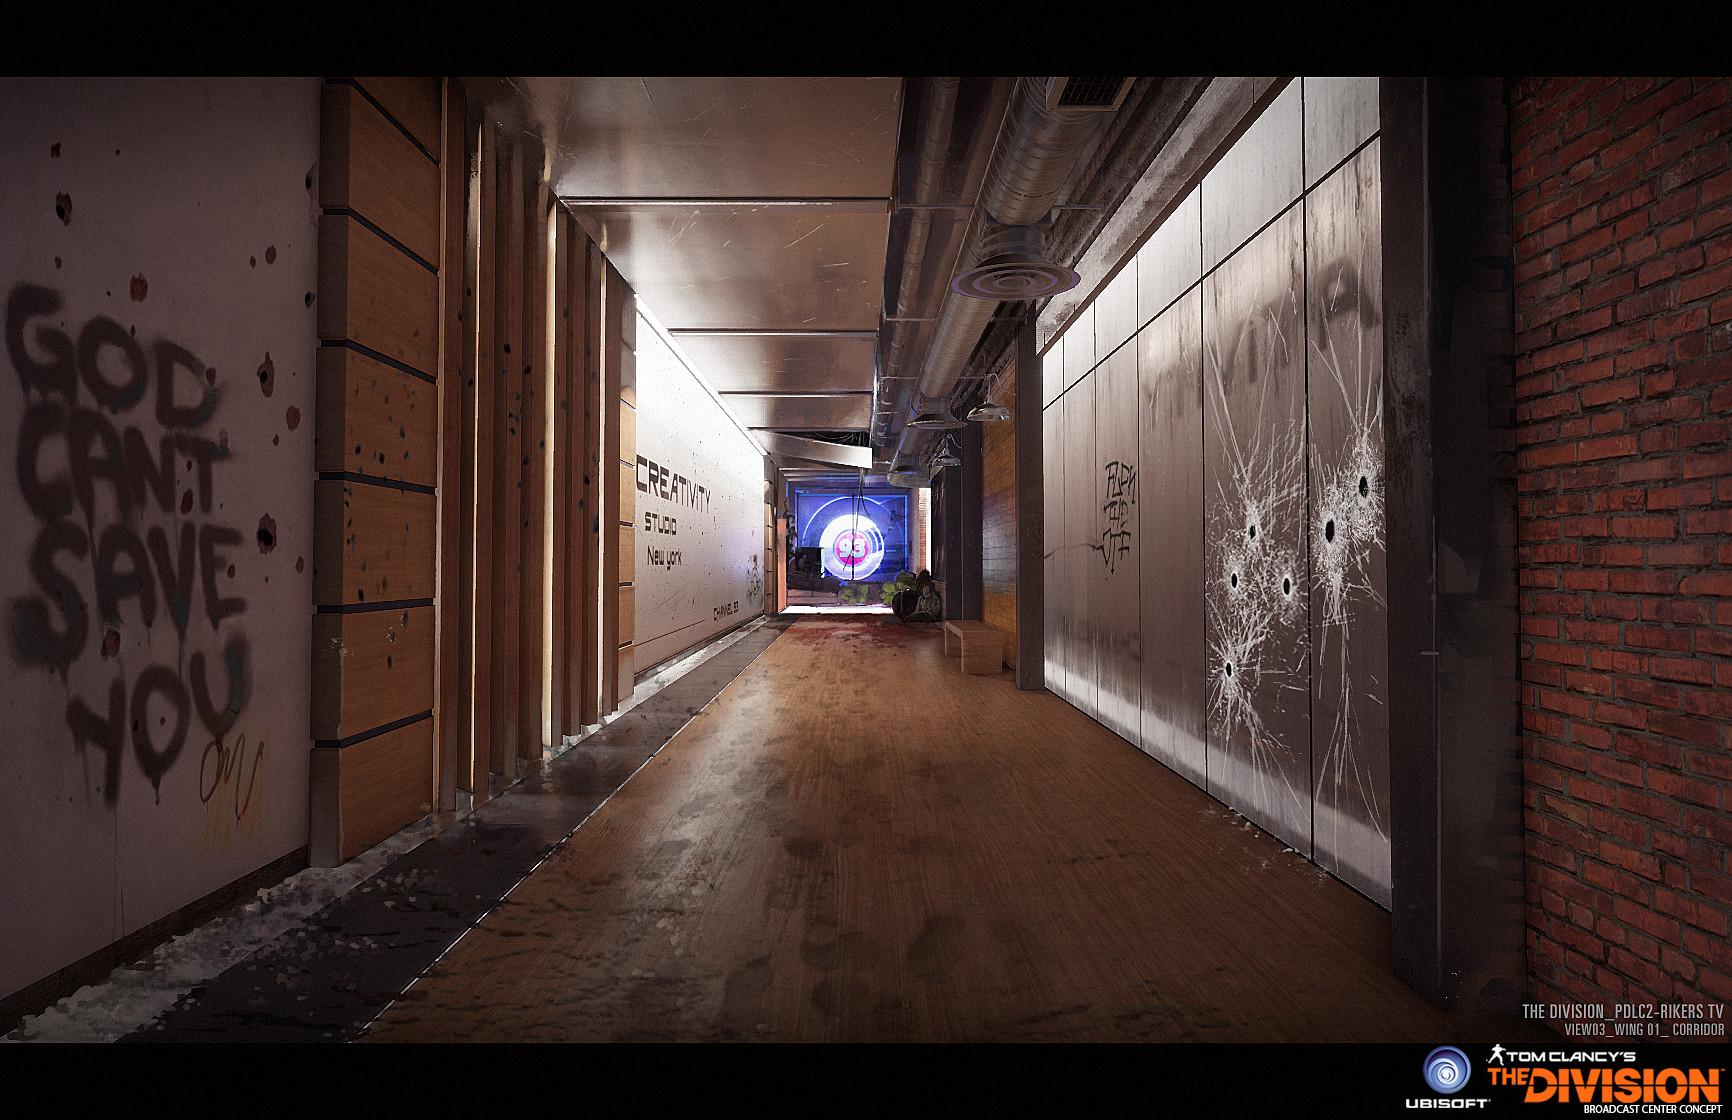 Geoffrey Bire - The Division Concept Art